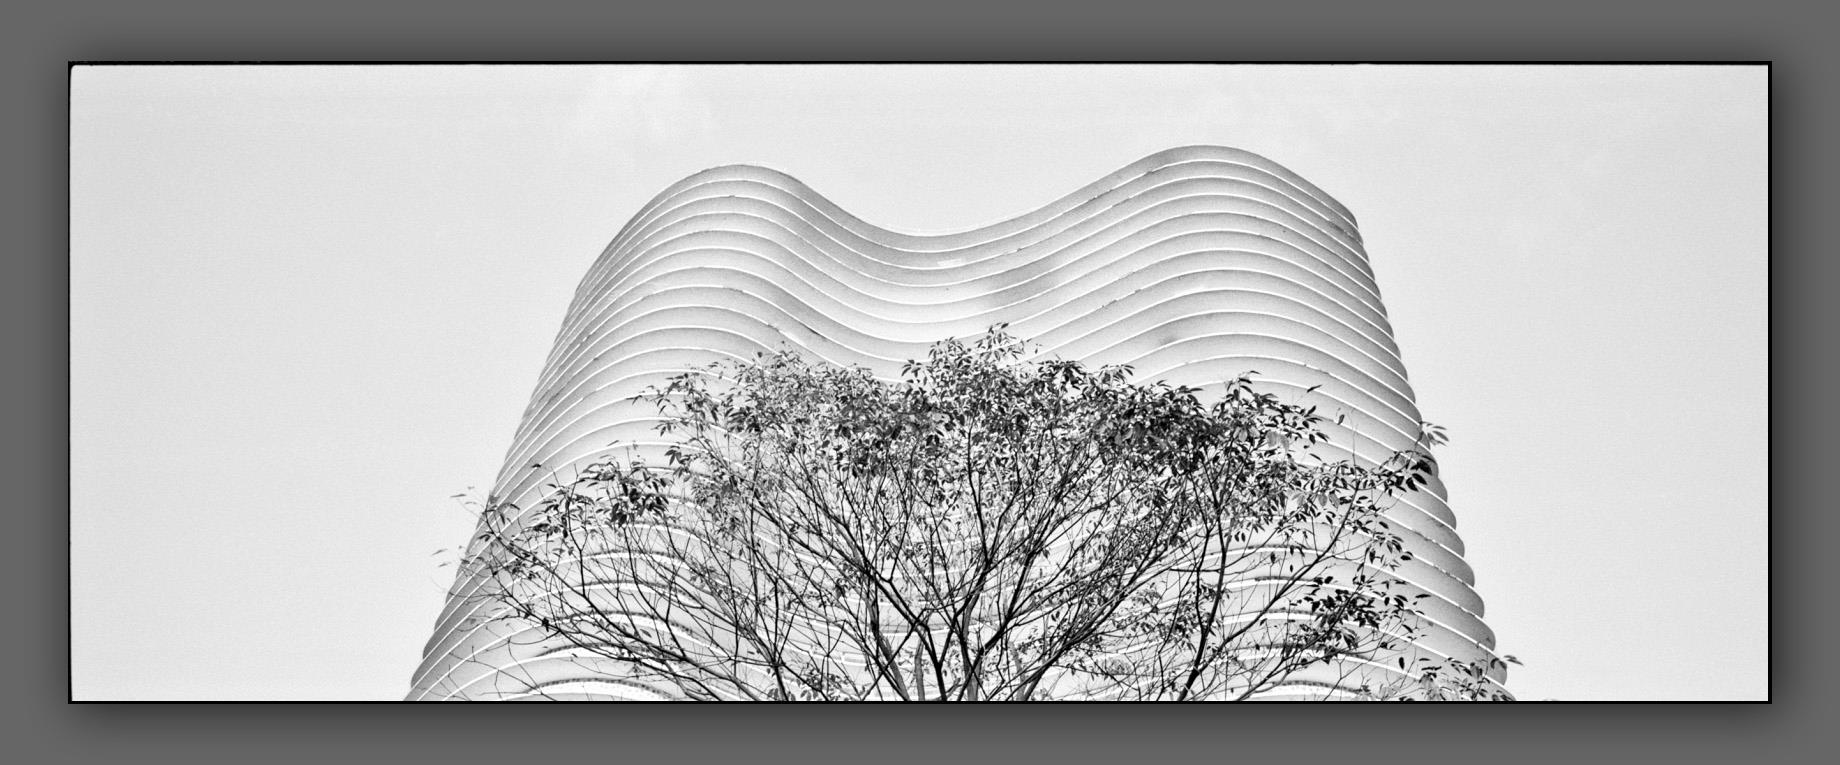 Niemeyer's woman